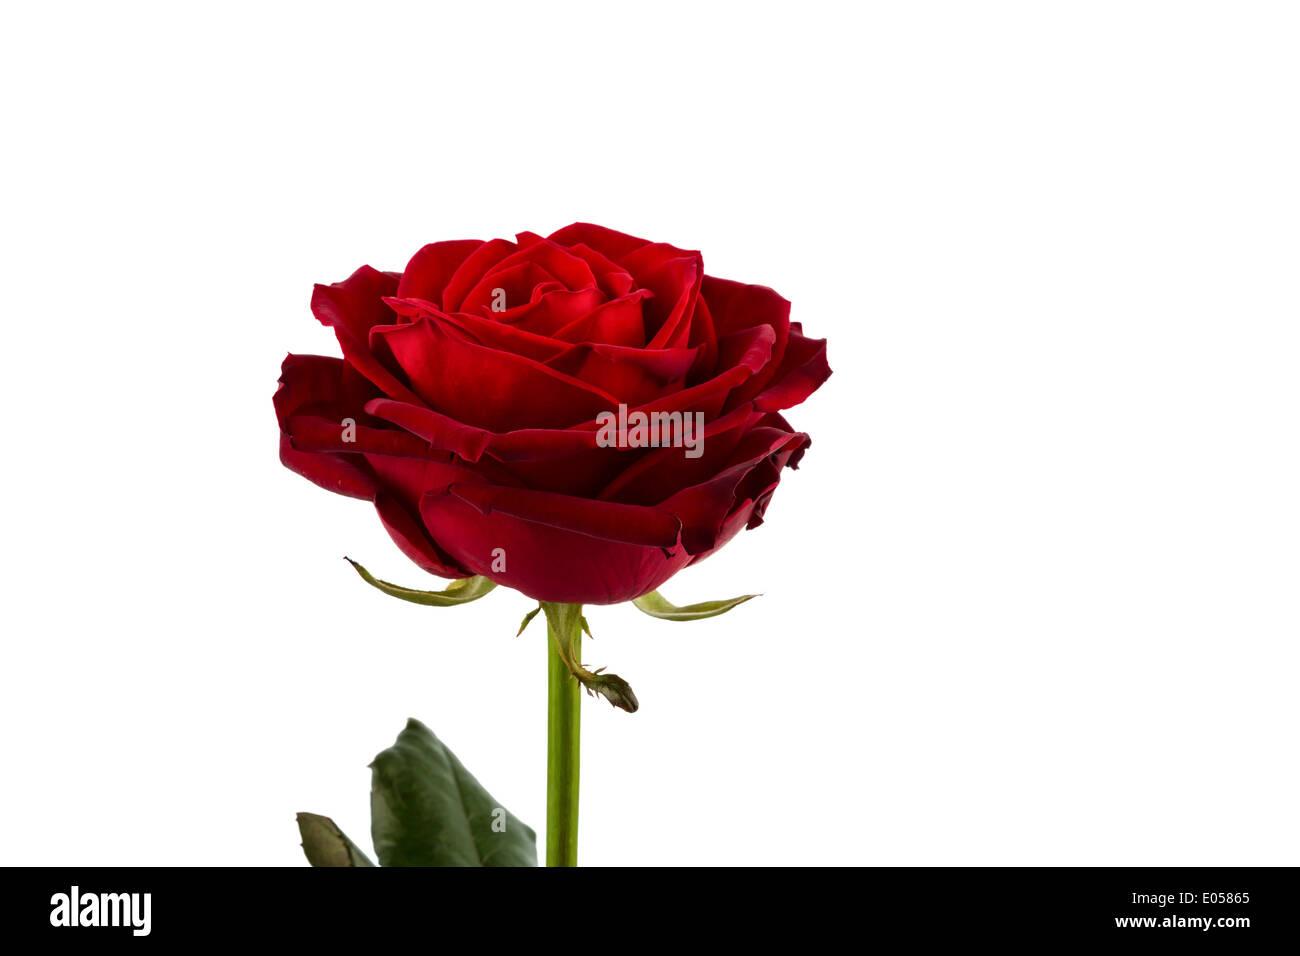 A red rose before white background. Symbolic photo for beauty, love, Valentinstag, Eine rote Rose vor weissem Hintergrund. Stock Photo